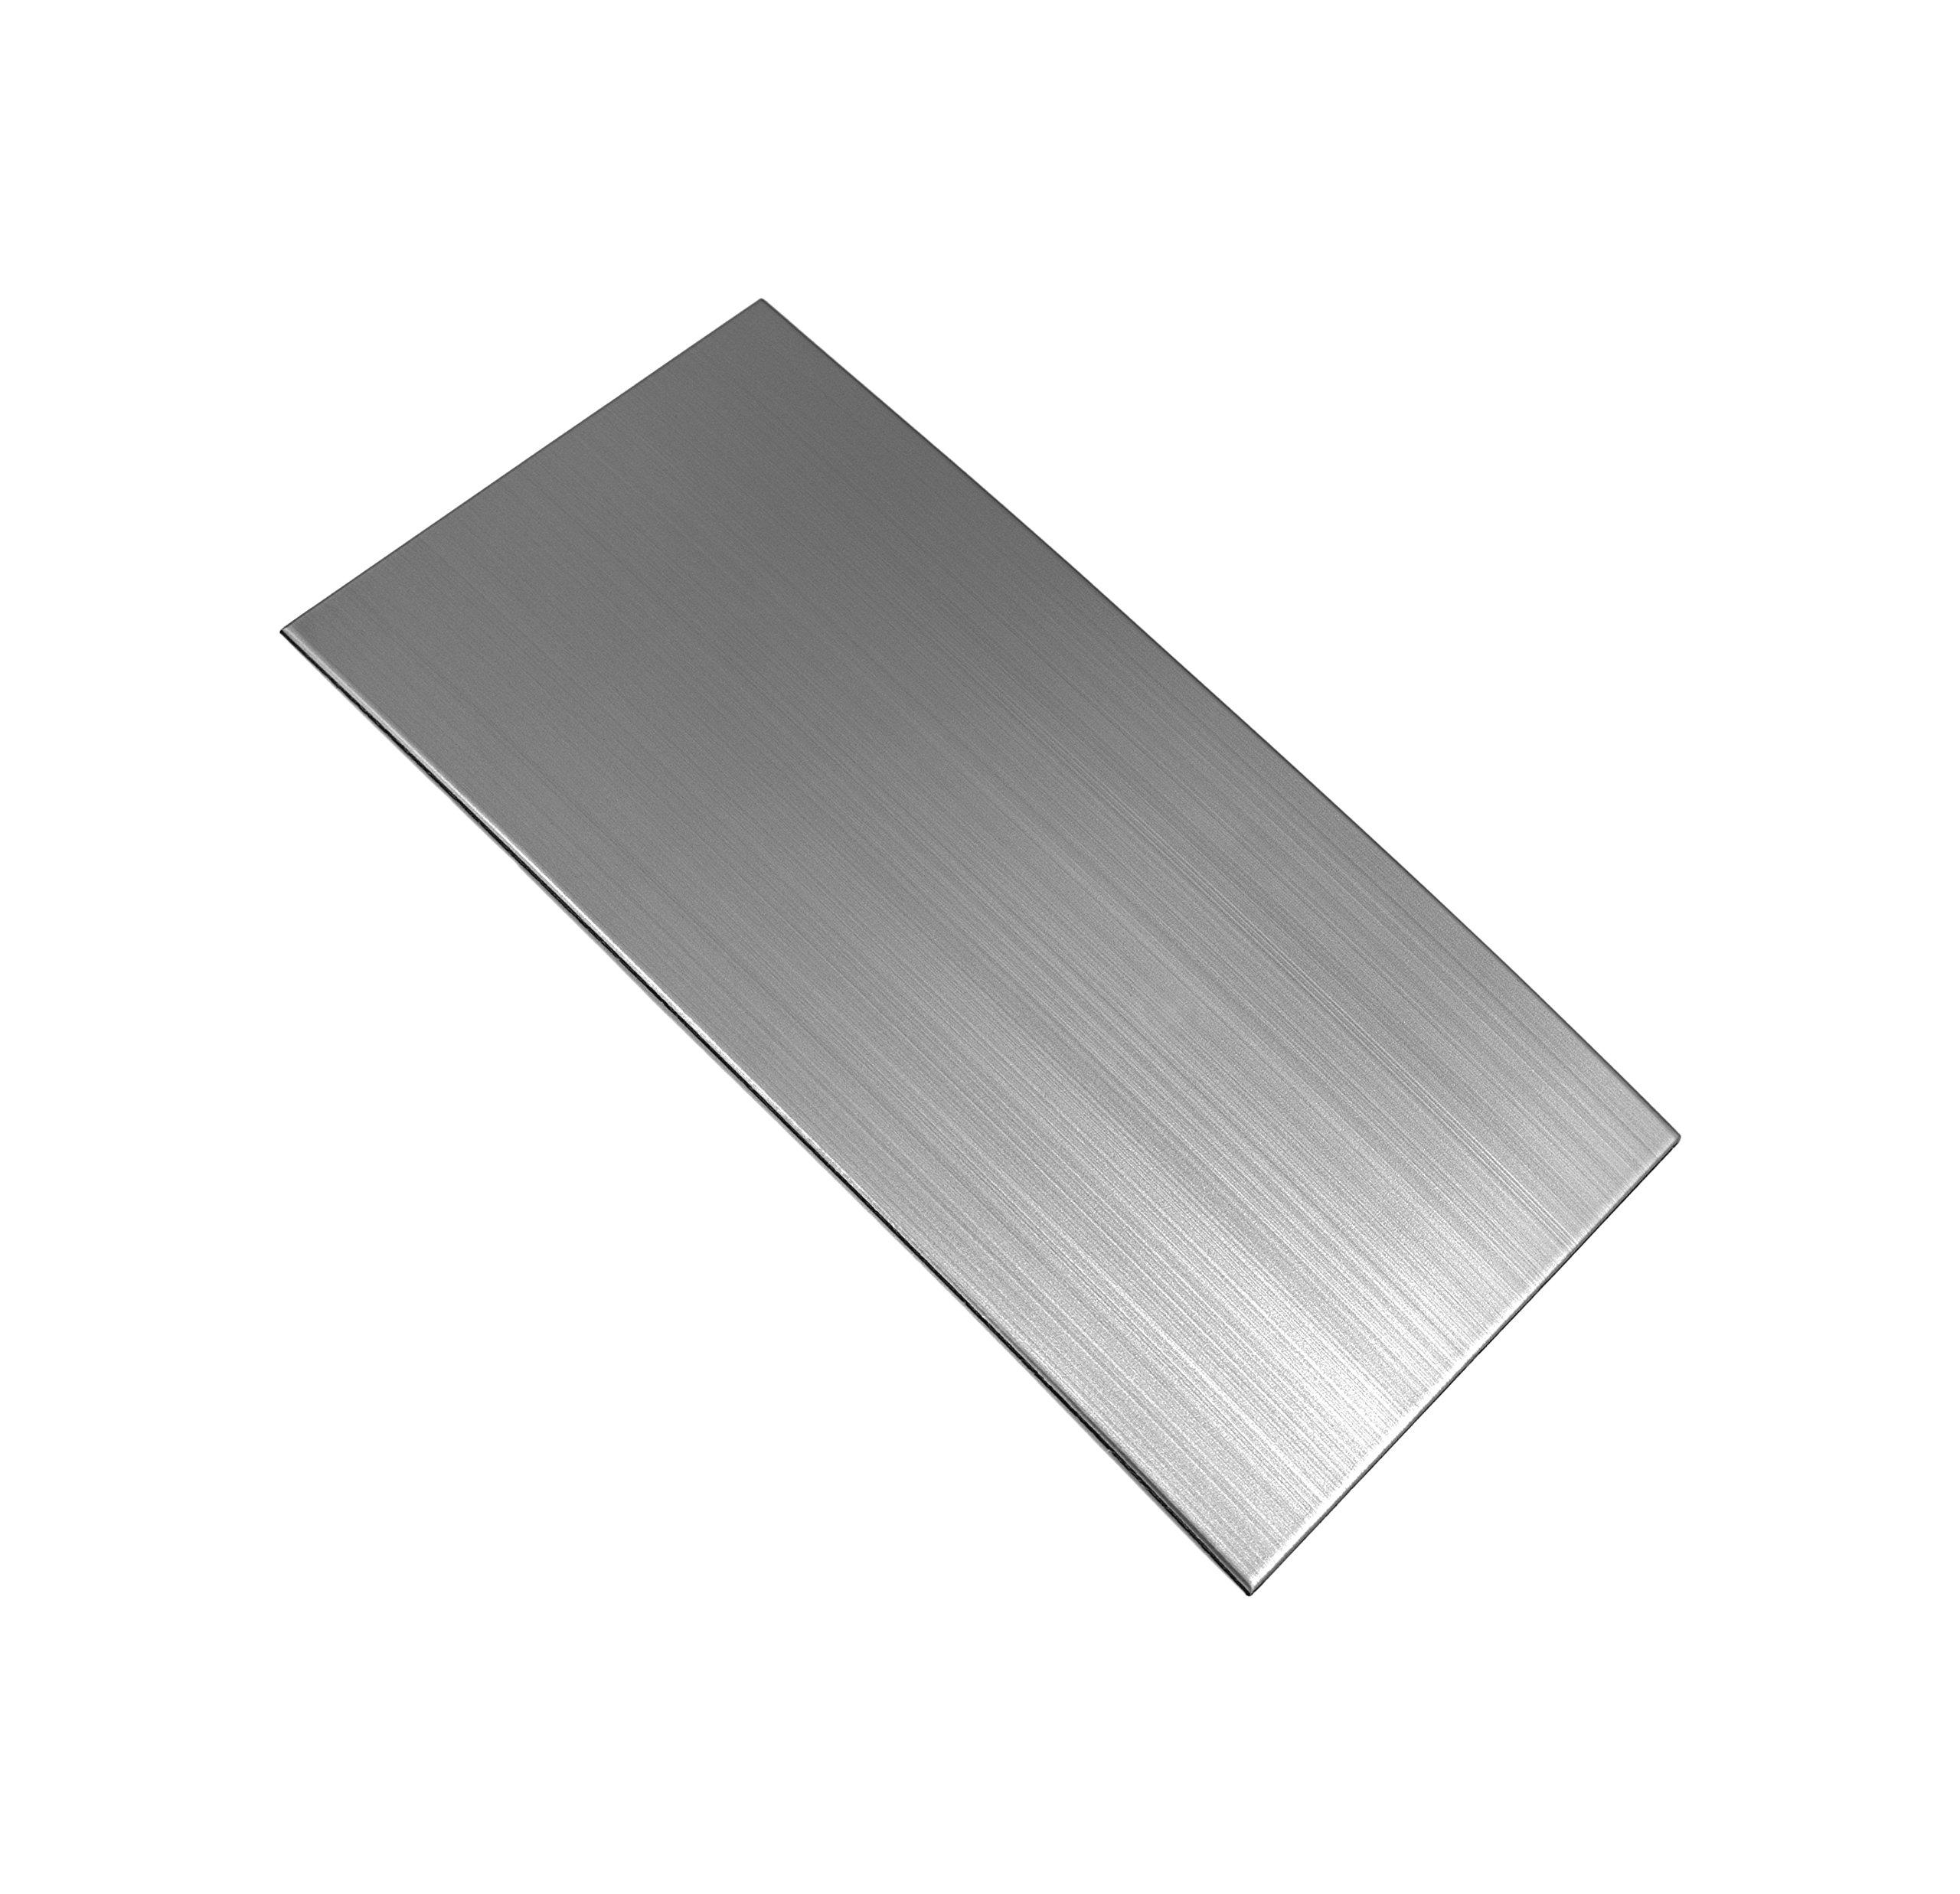 Ver Block Peel and Stick Design Stainless Steel DIY Interior Tile 20PCS (3.9 x 7.8 inch (20PCS), Brush Grey) by Ver Block